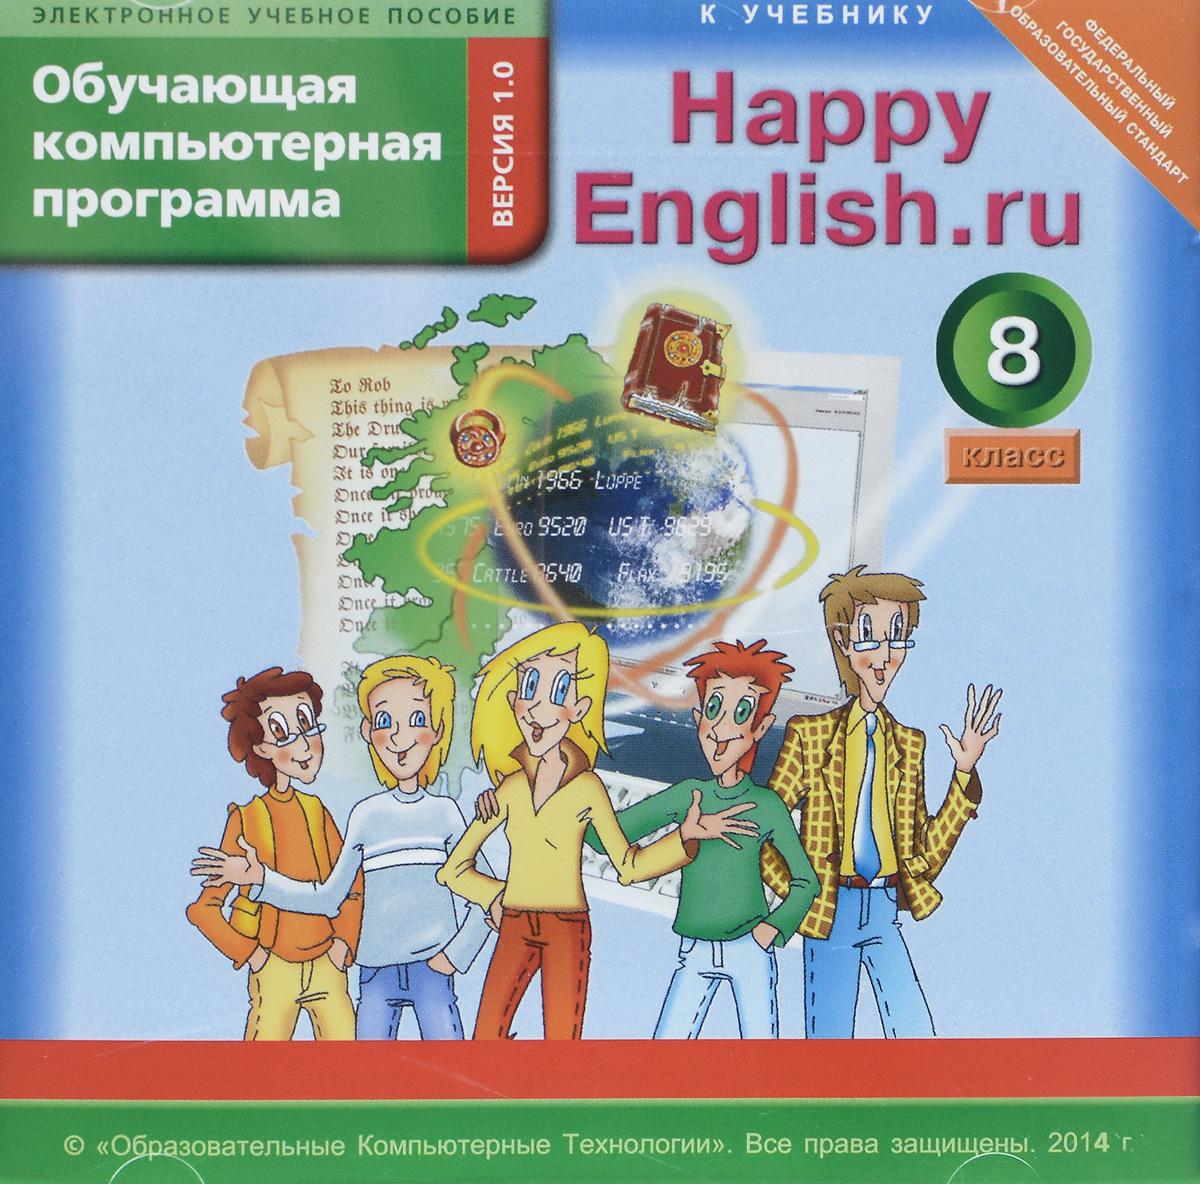 Happy English.ru 8 / Счастливый английский.ру. 8 класс. Обучающая компьютерная программа Титул